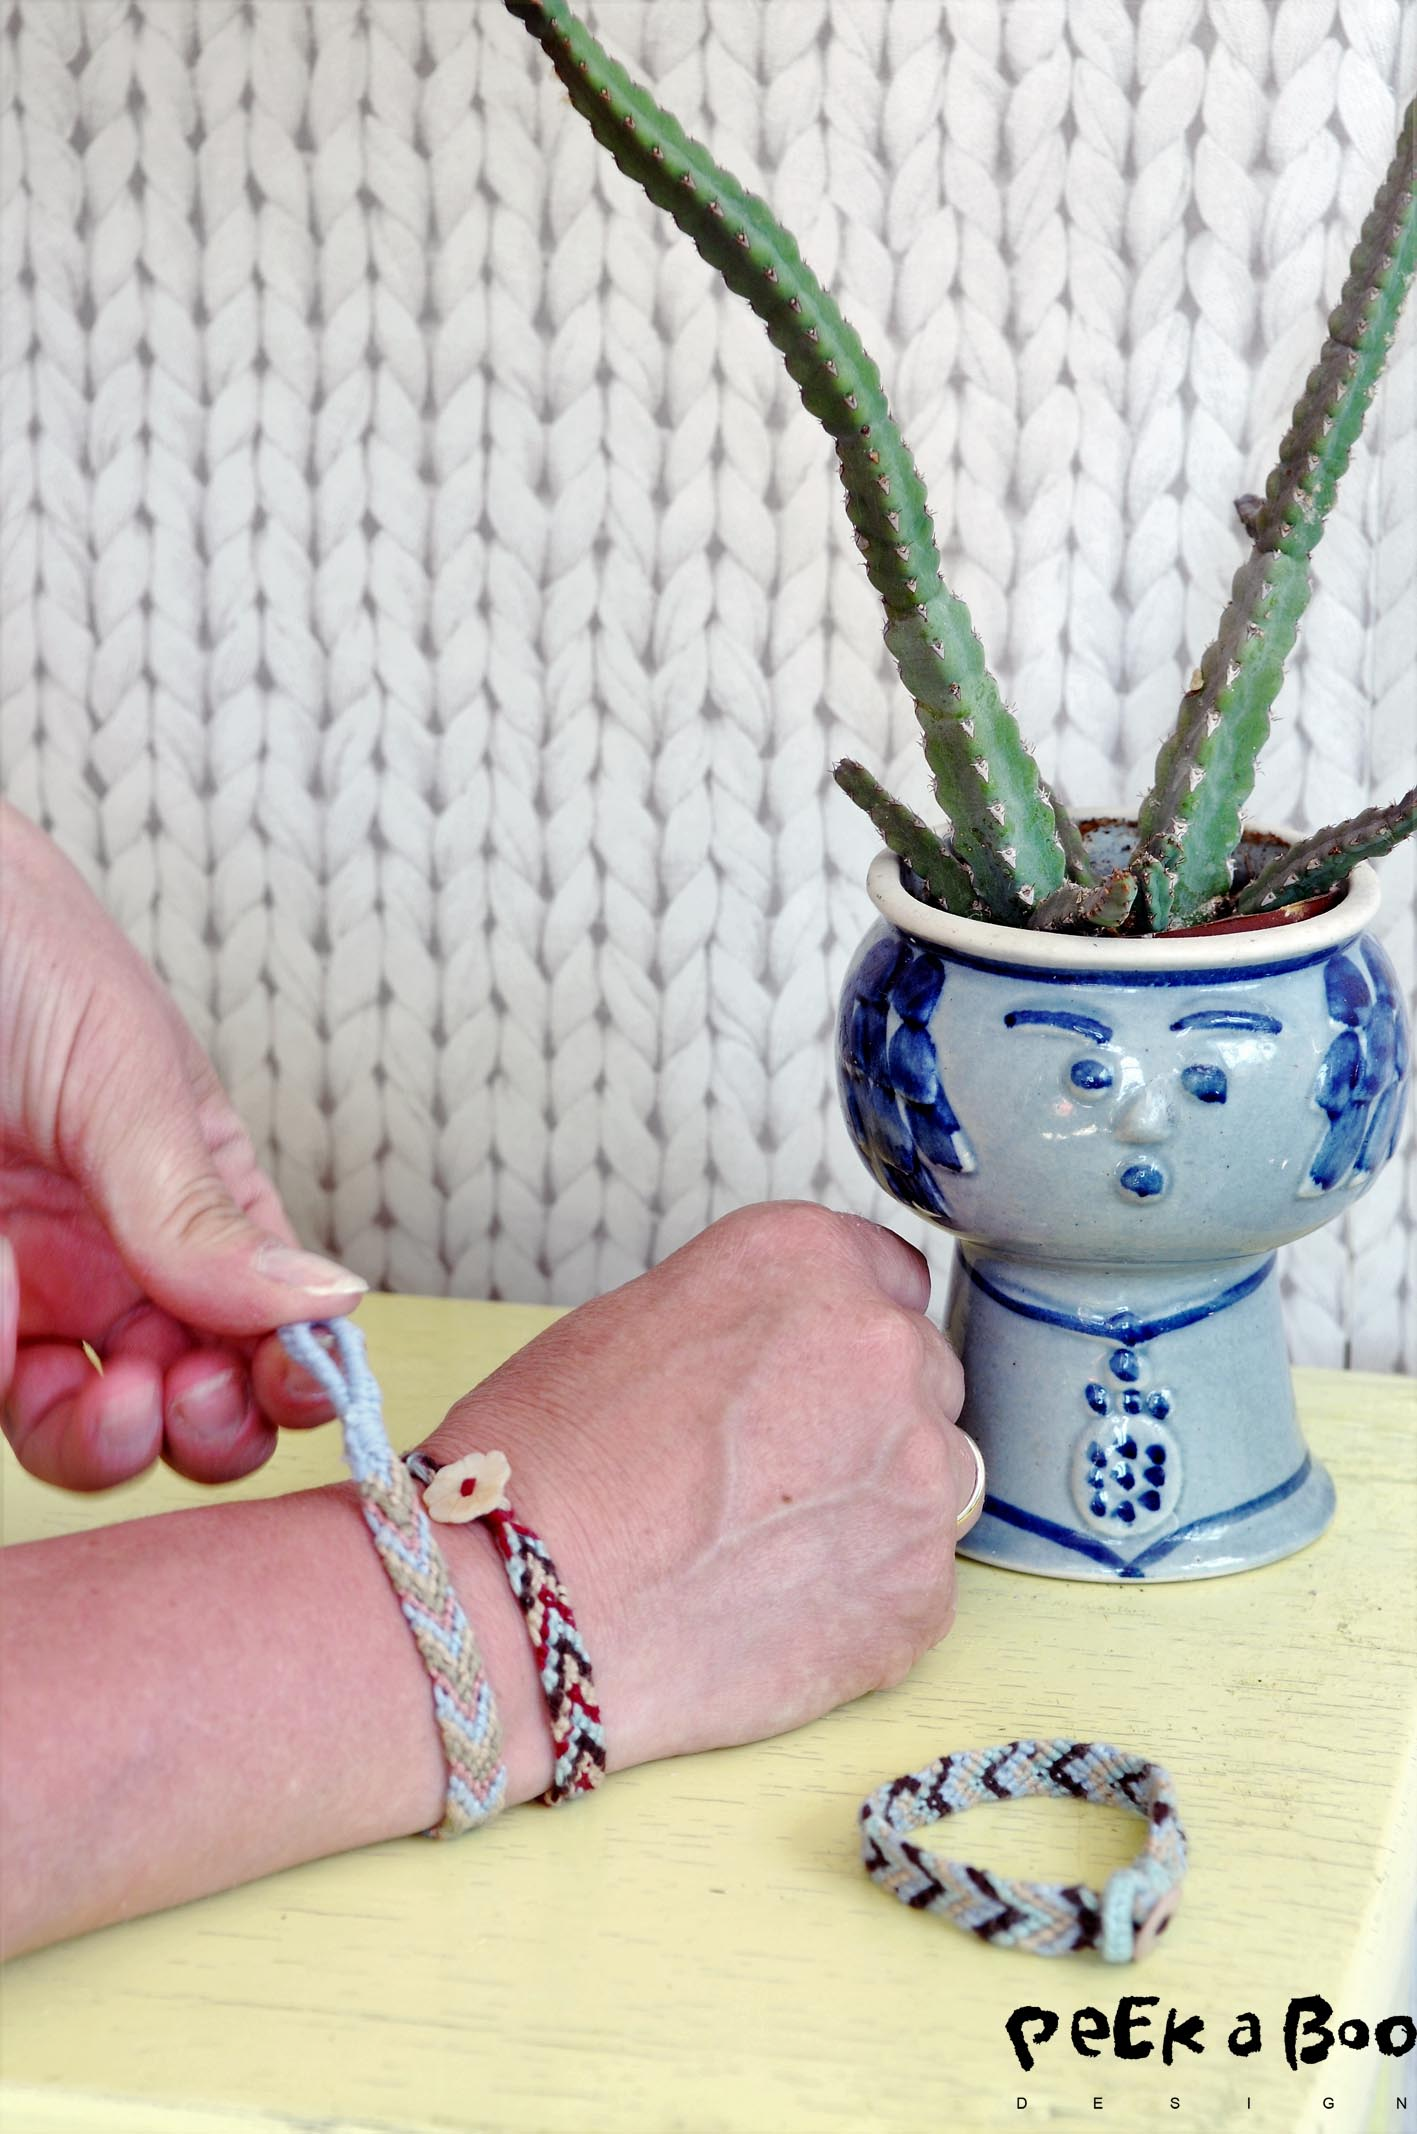 freindship bracelet made of cotton yarns.